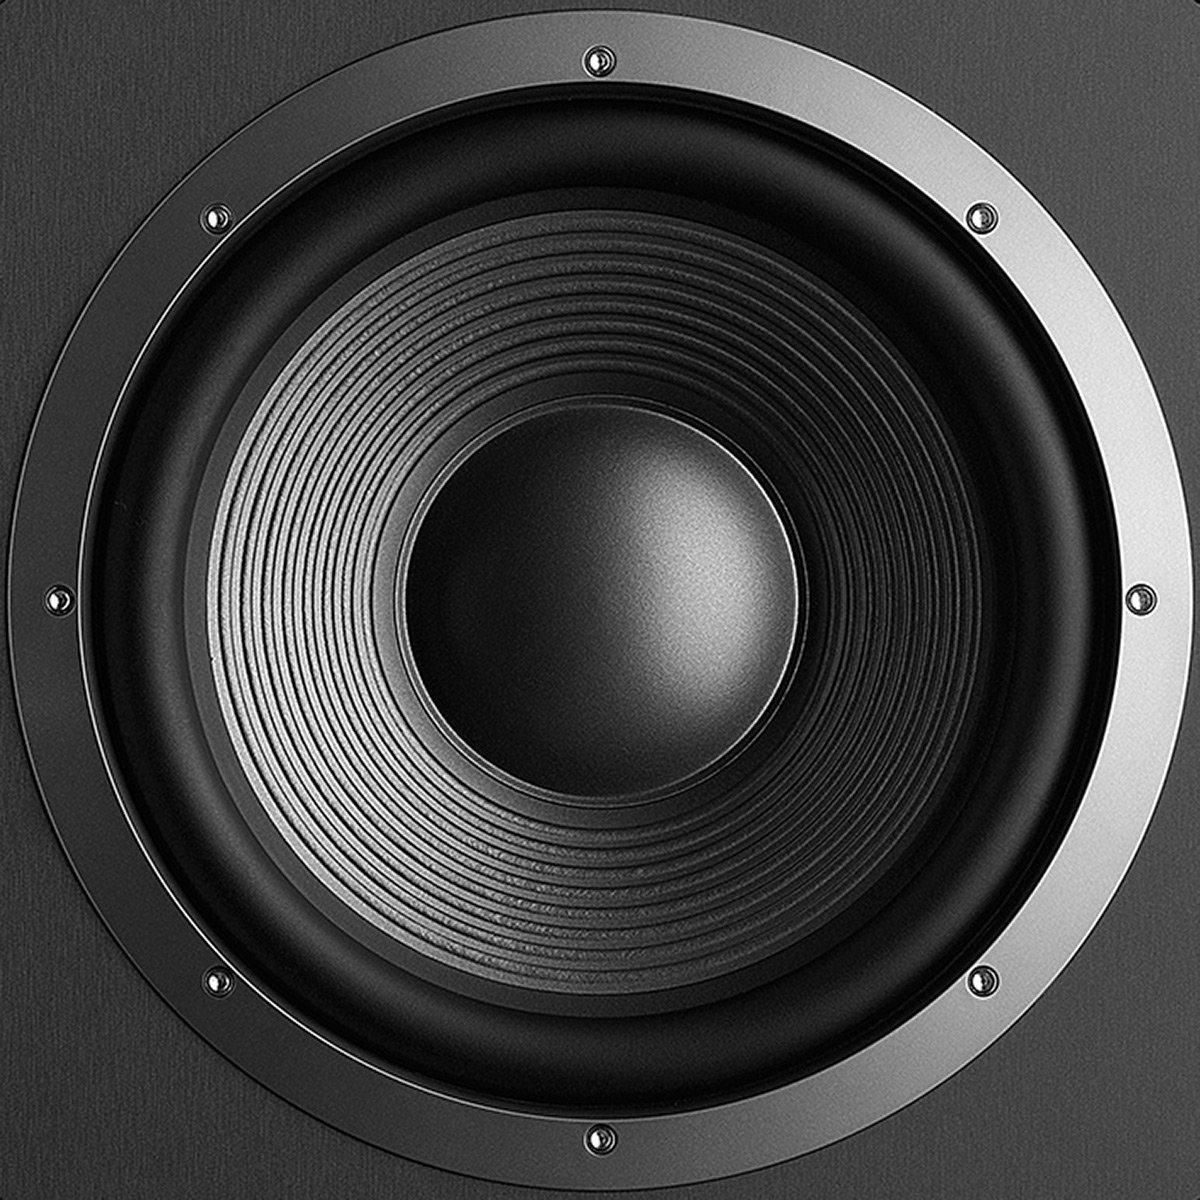 Amazon.com: JBL ES250PBK High-Performance 12-Inch Powered